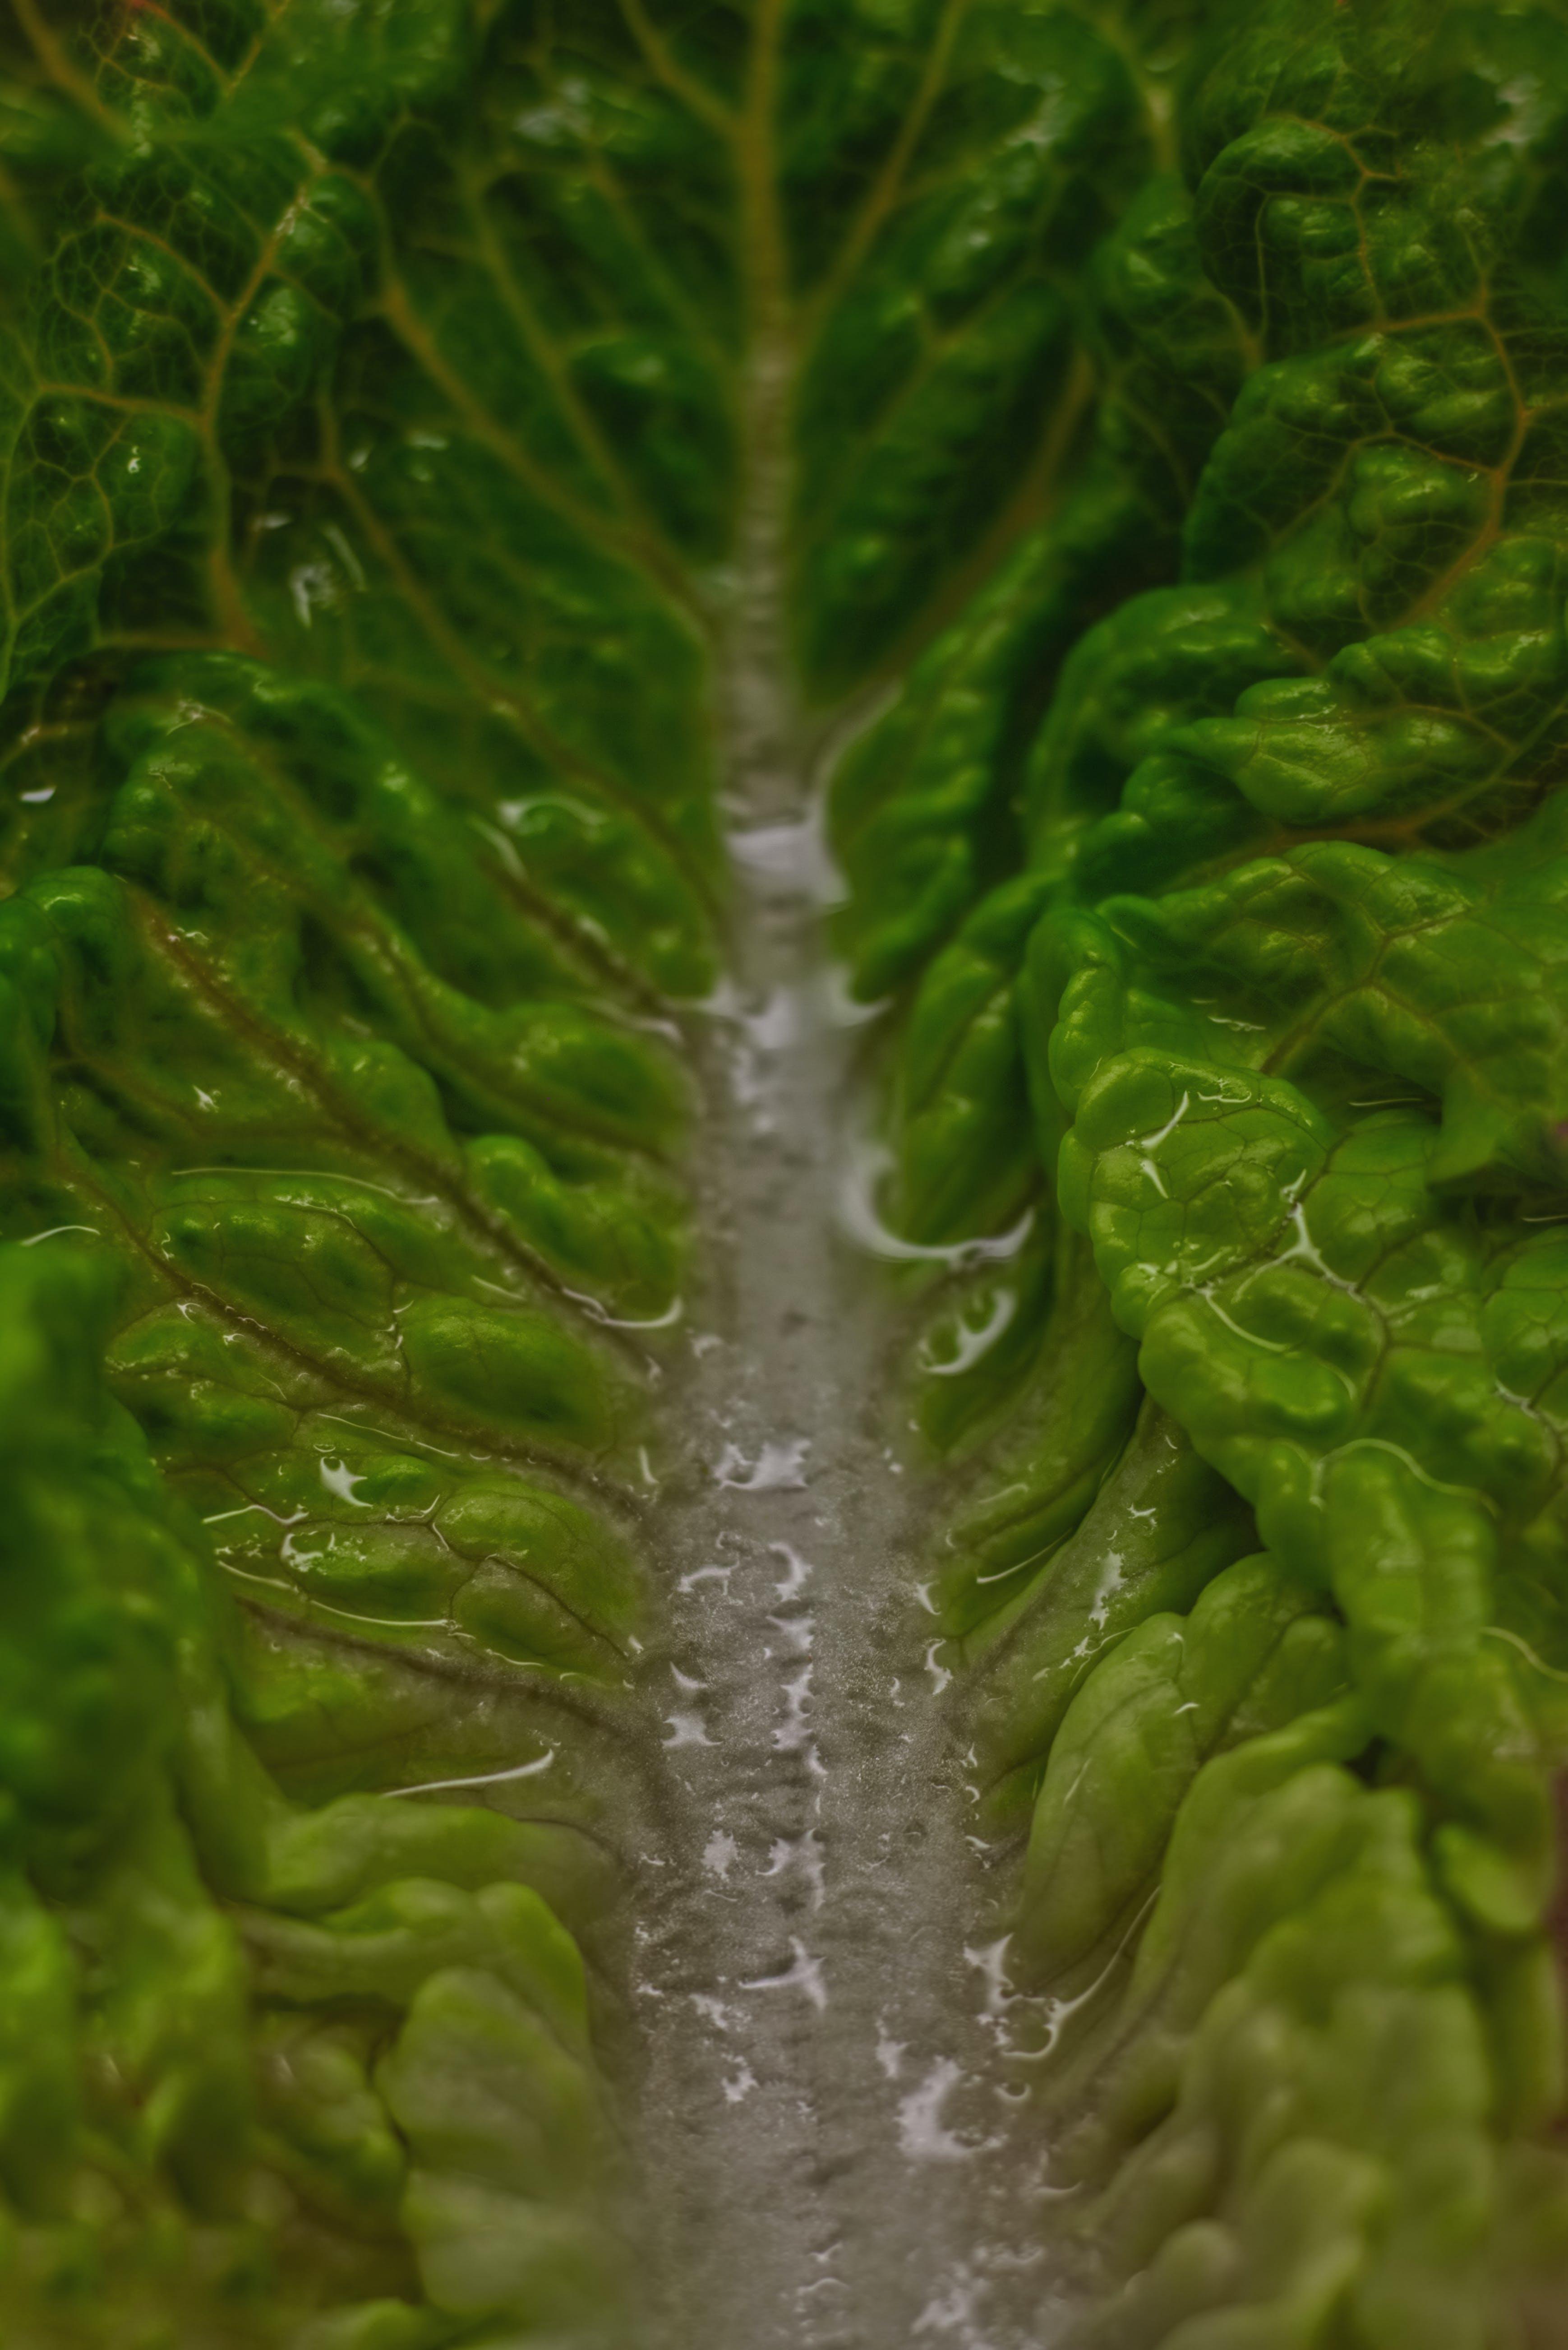 Free stock photo of green, kitchen, lettuce, macro photo